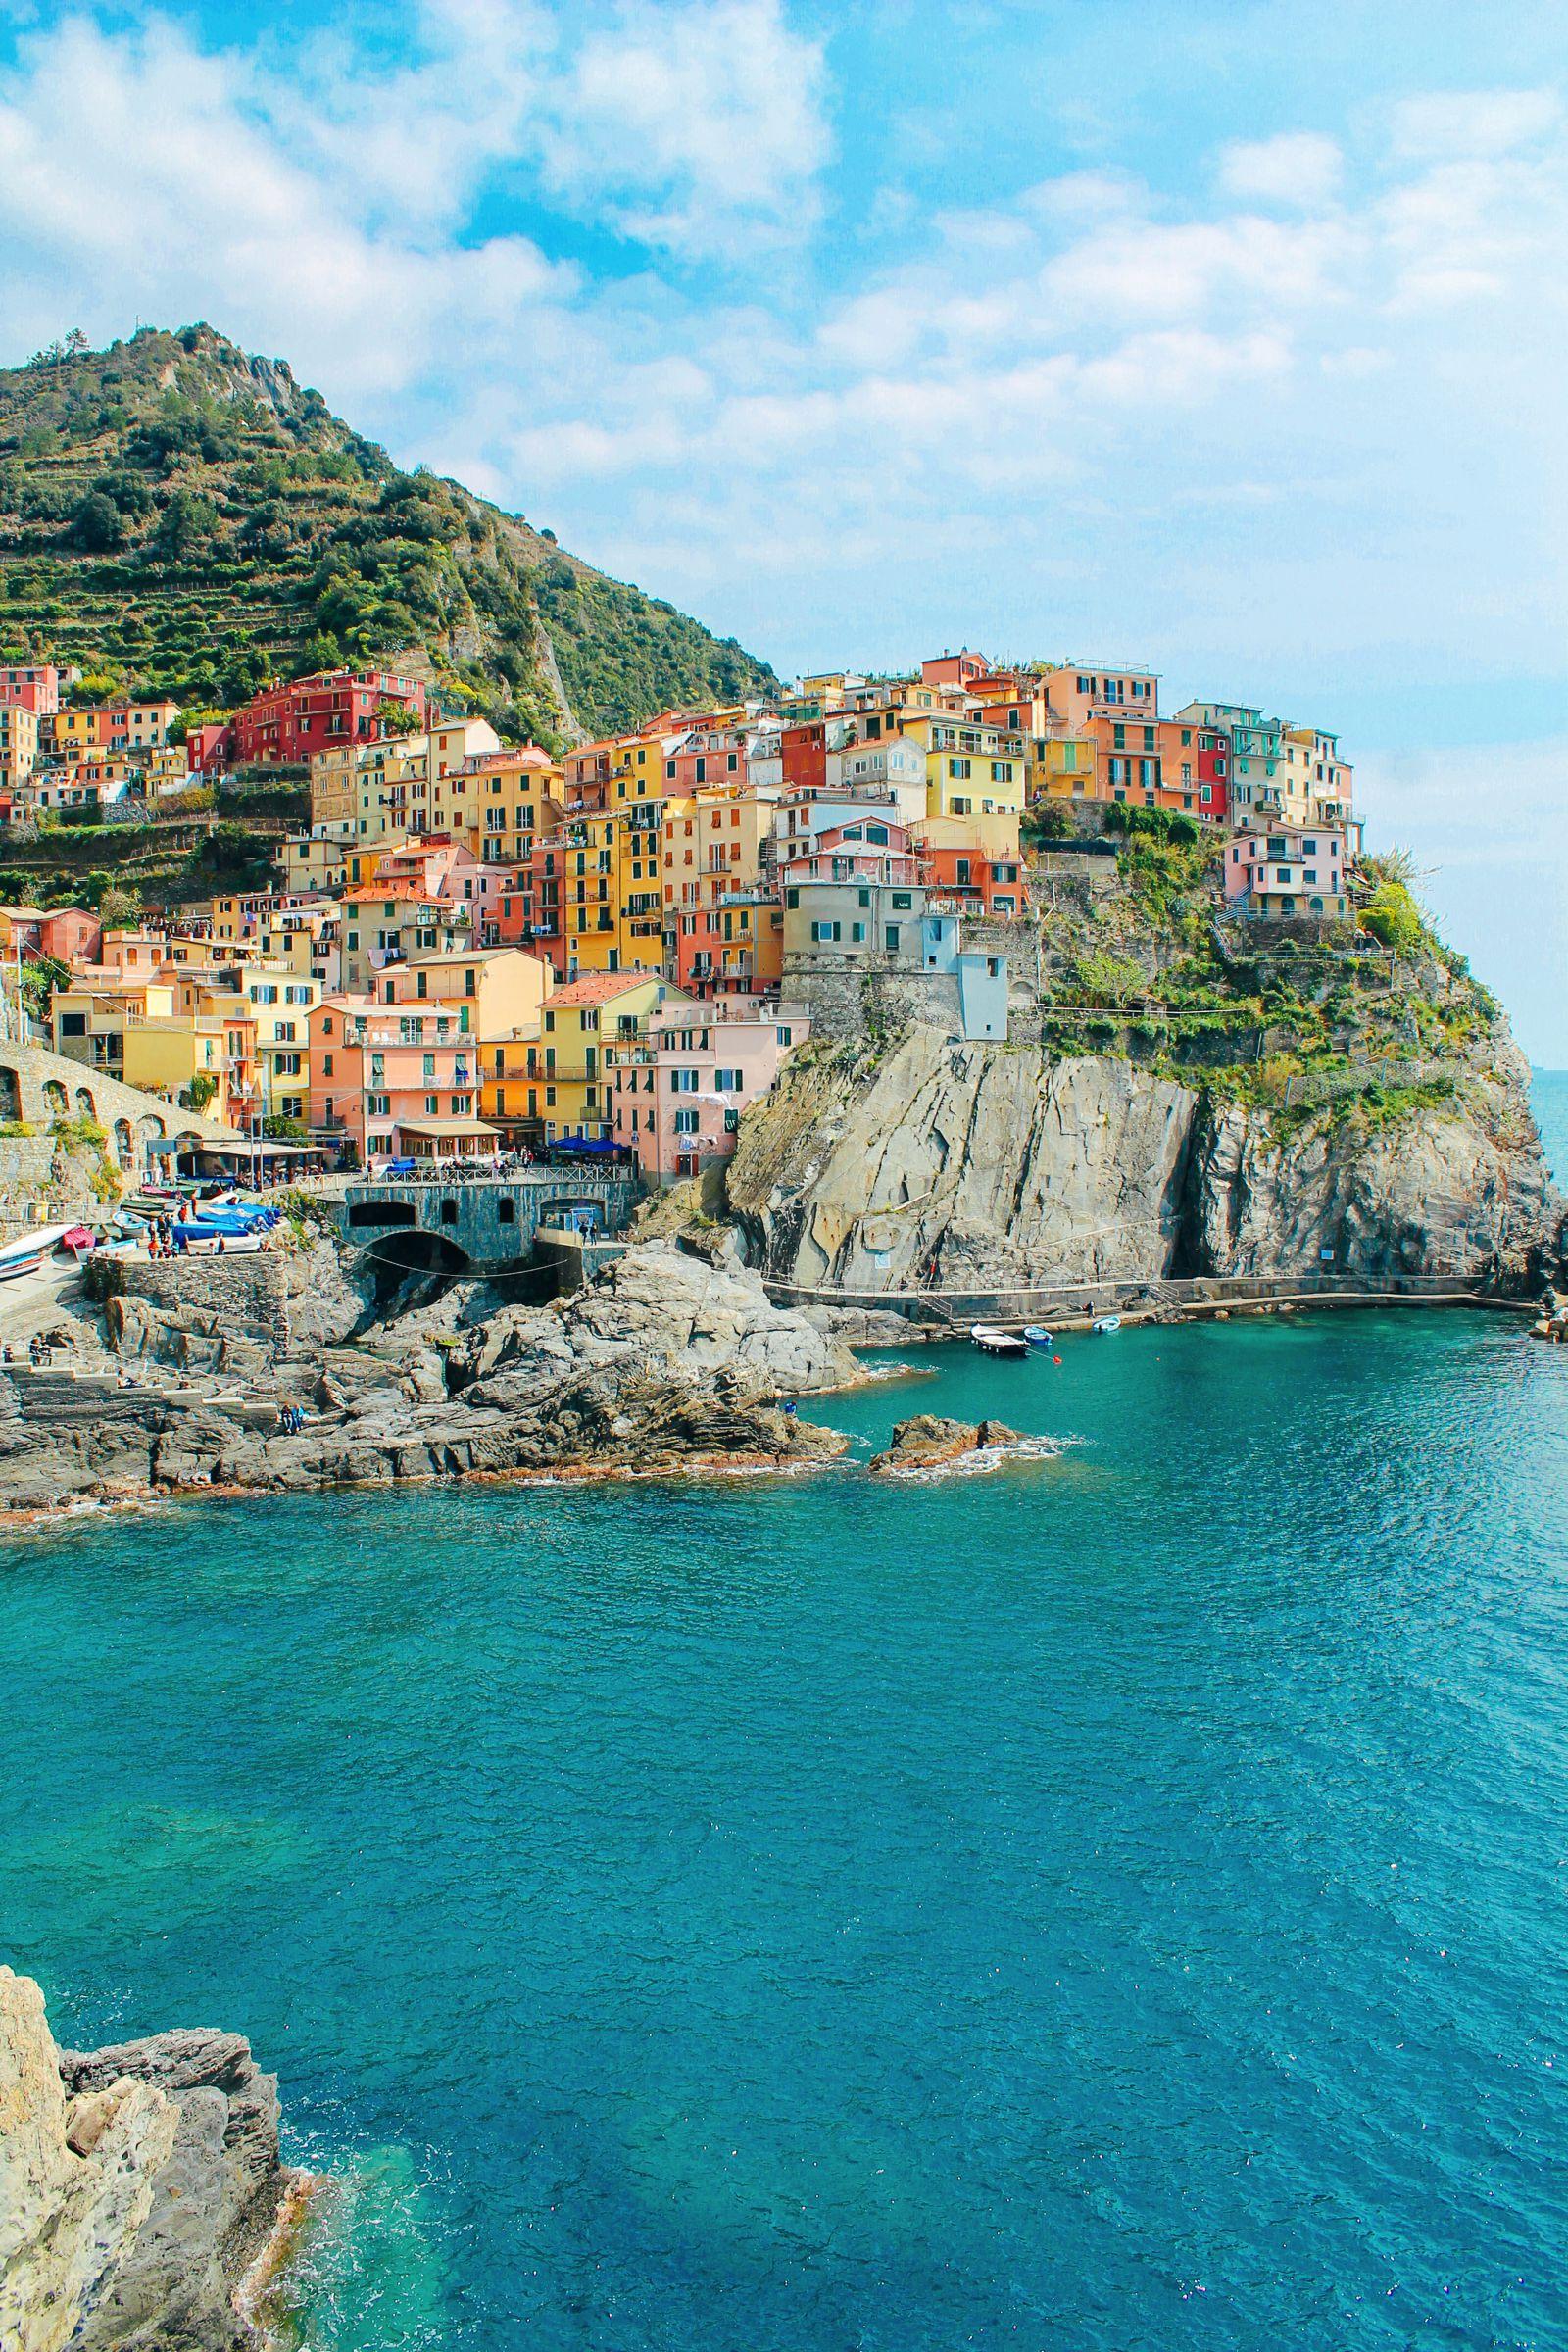 Manarola in Cinque Terre, Italy - The Photo Diary! [2 of 5] (5)